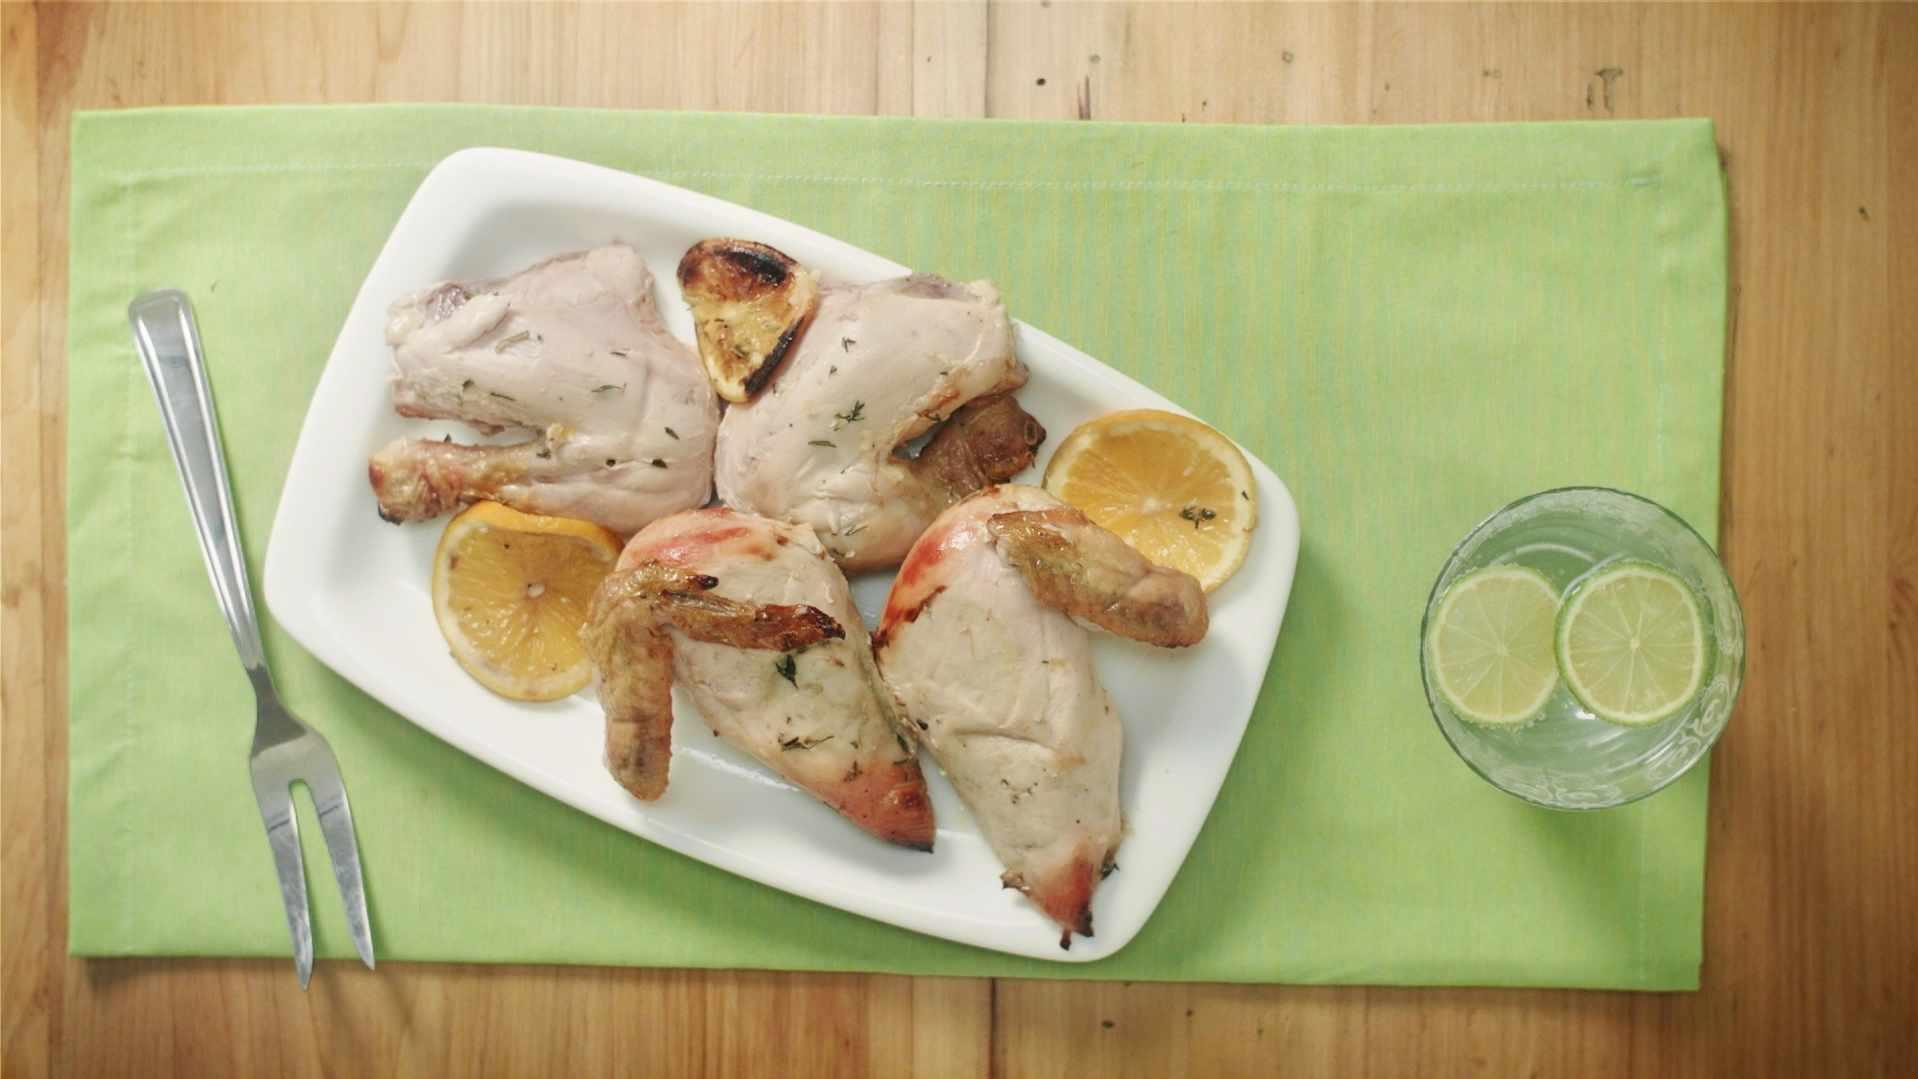 making-mayo-recipes-cornish-hen-1-16-x-9